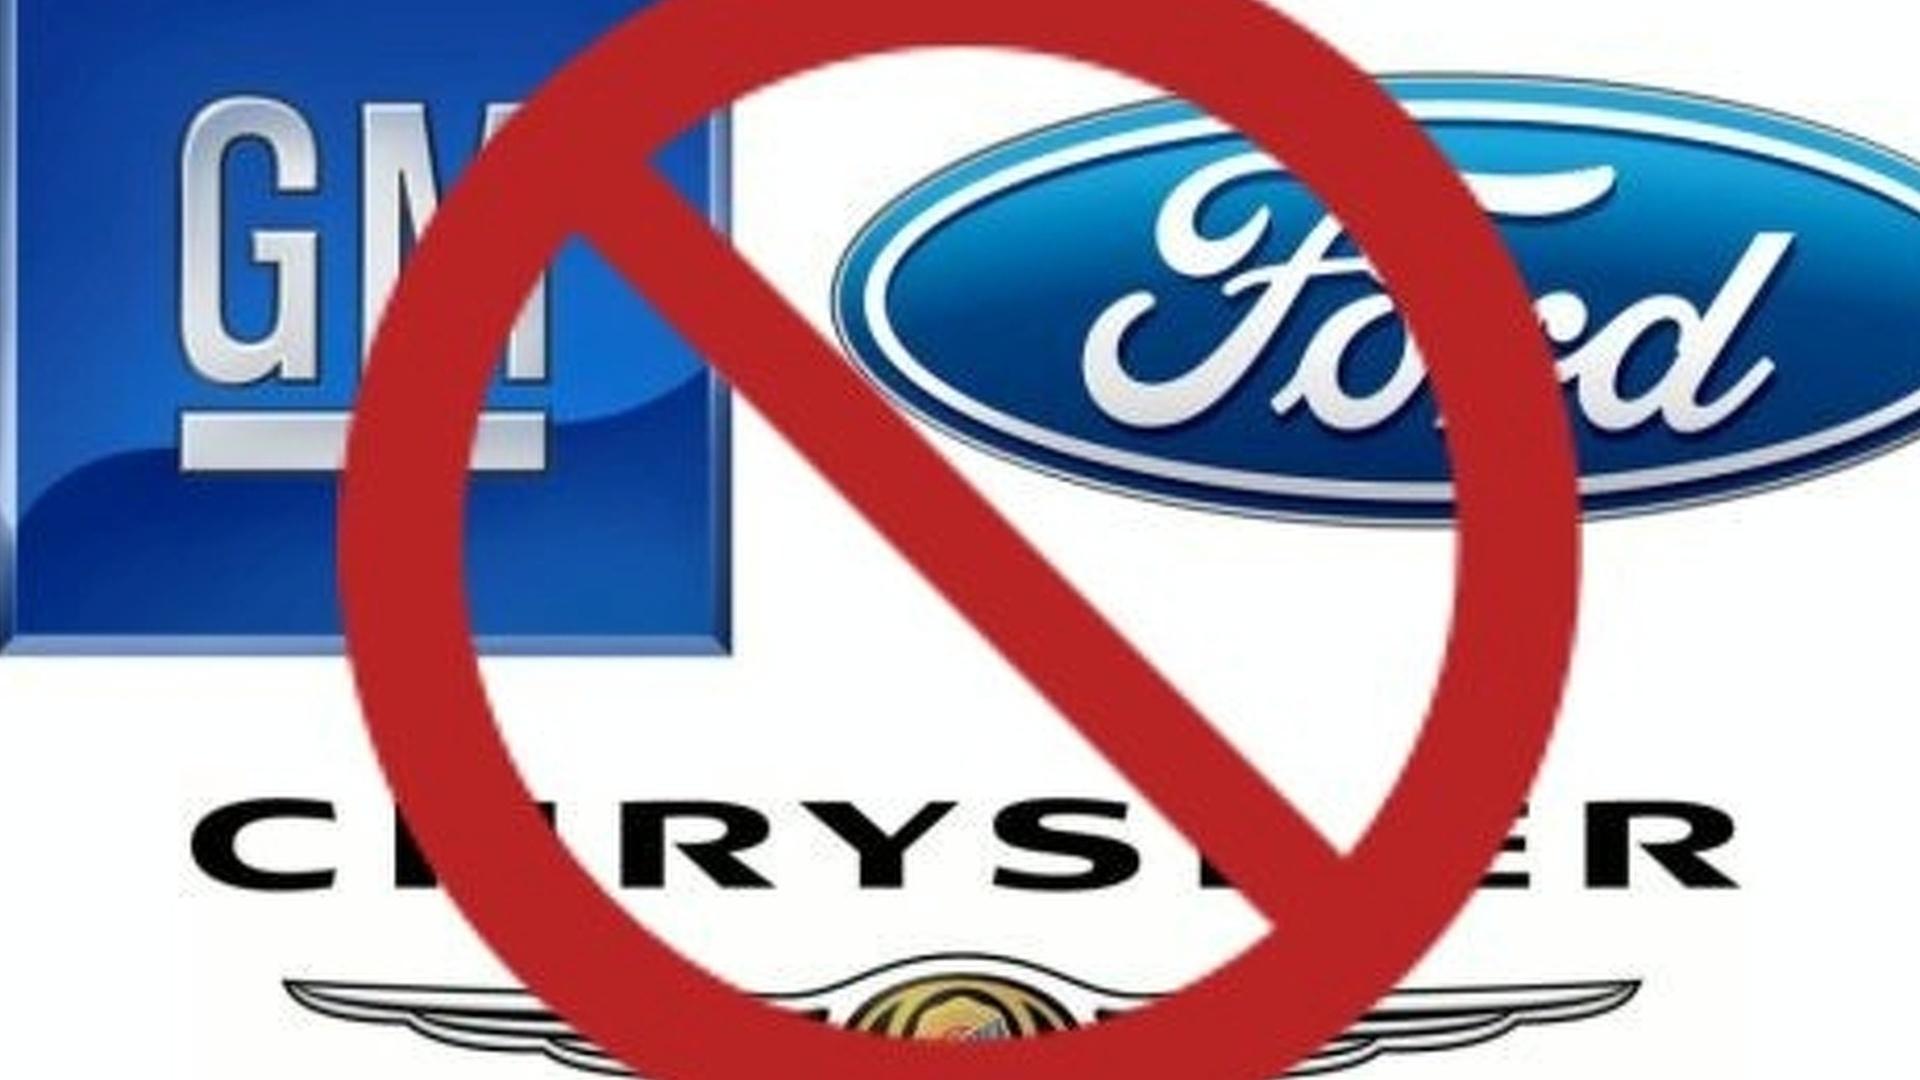 No $25-billion bailout package for automakers - Senate vote canceled